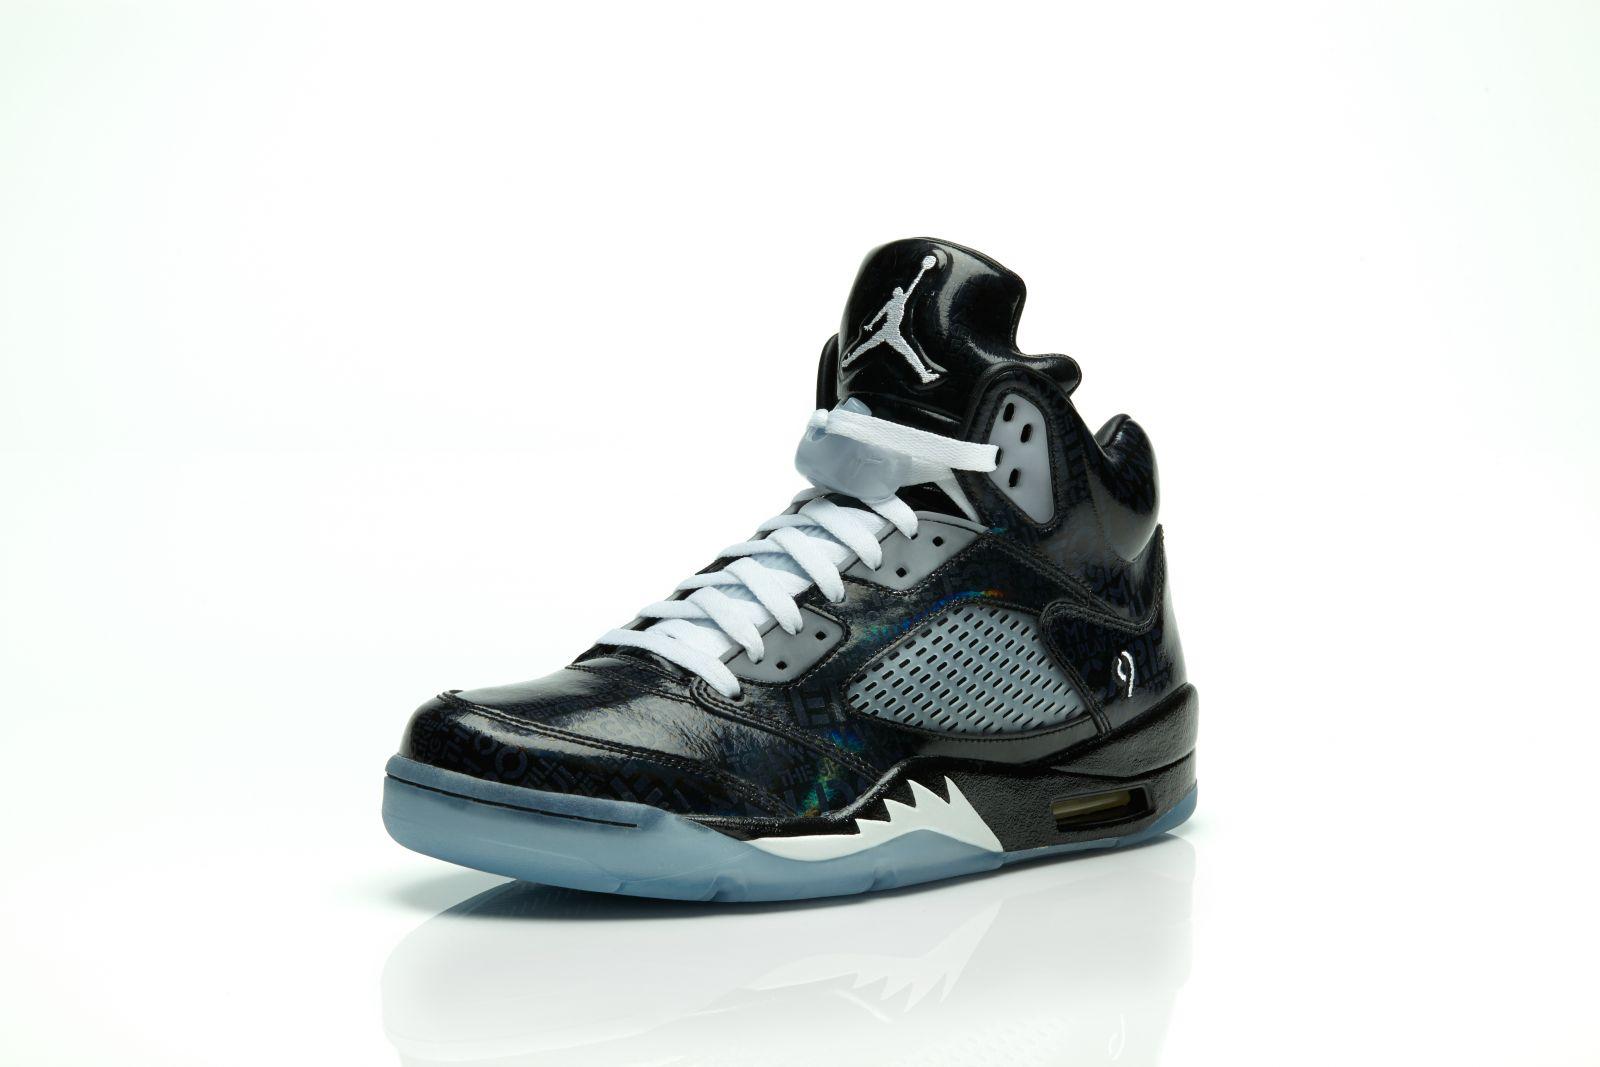 47c274b2d1f5b0 The 10 Best Jordan Brand Releases of 2013